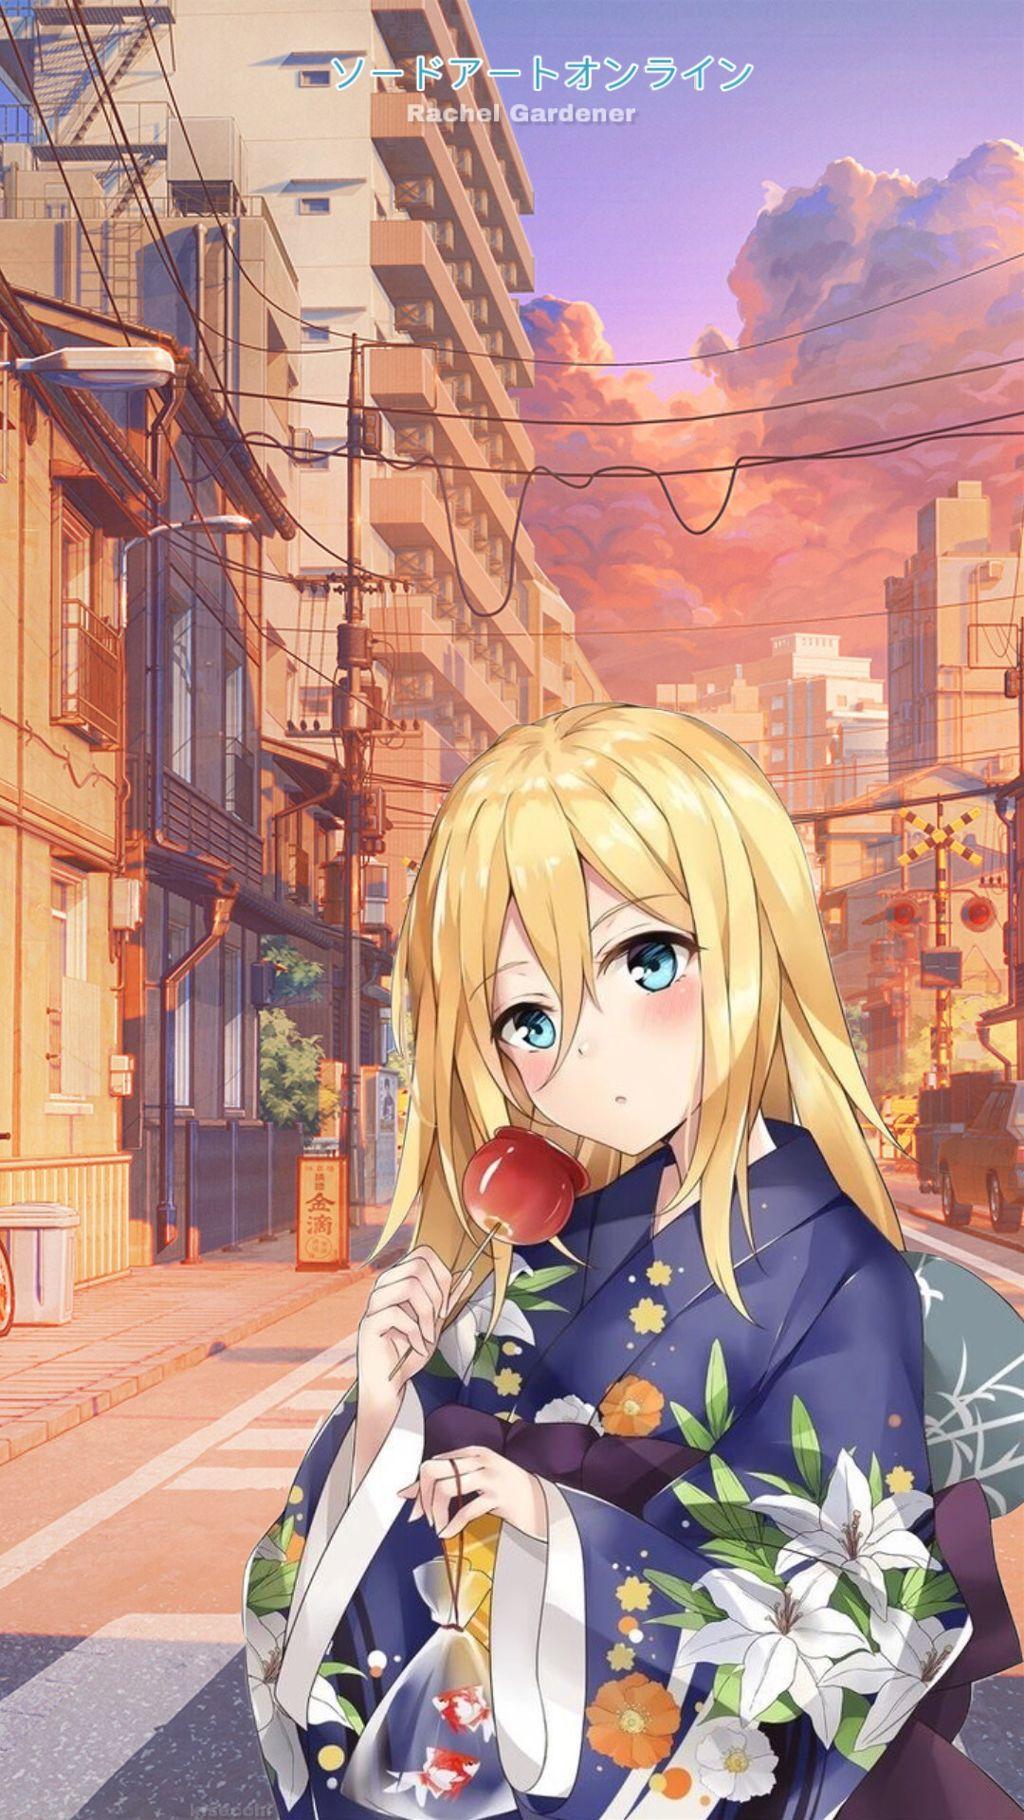 Rachel Gardener Of Angel Of Death Wallpaper Anime Fre